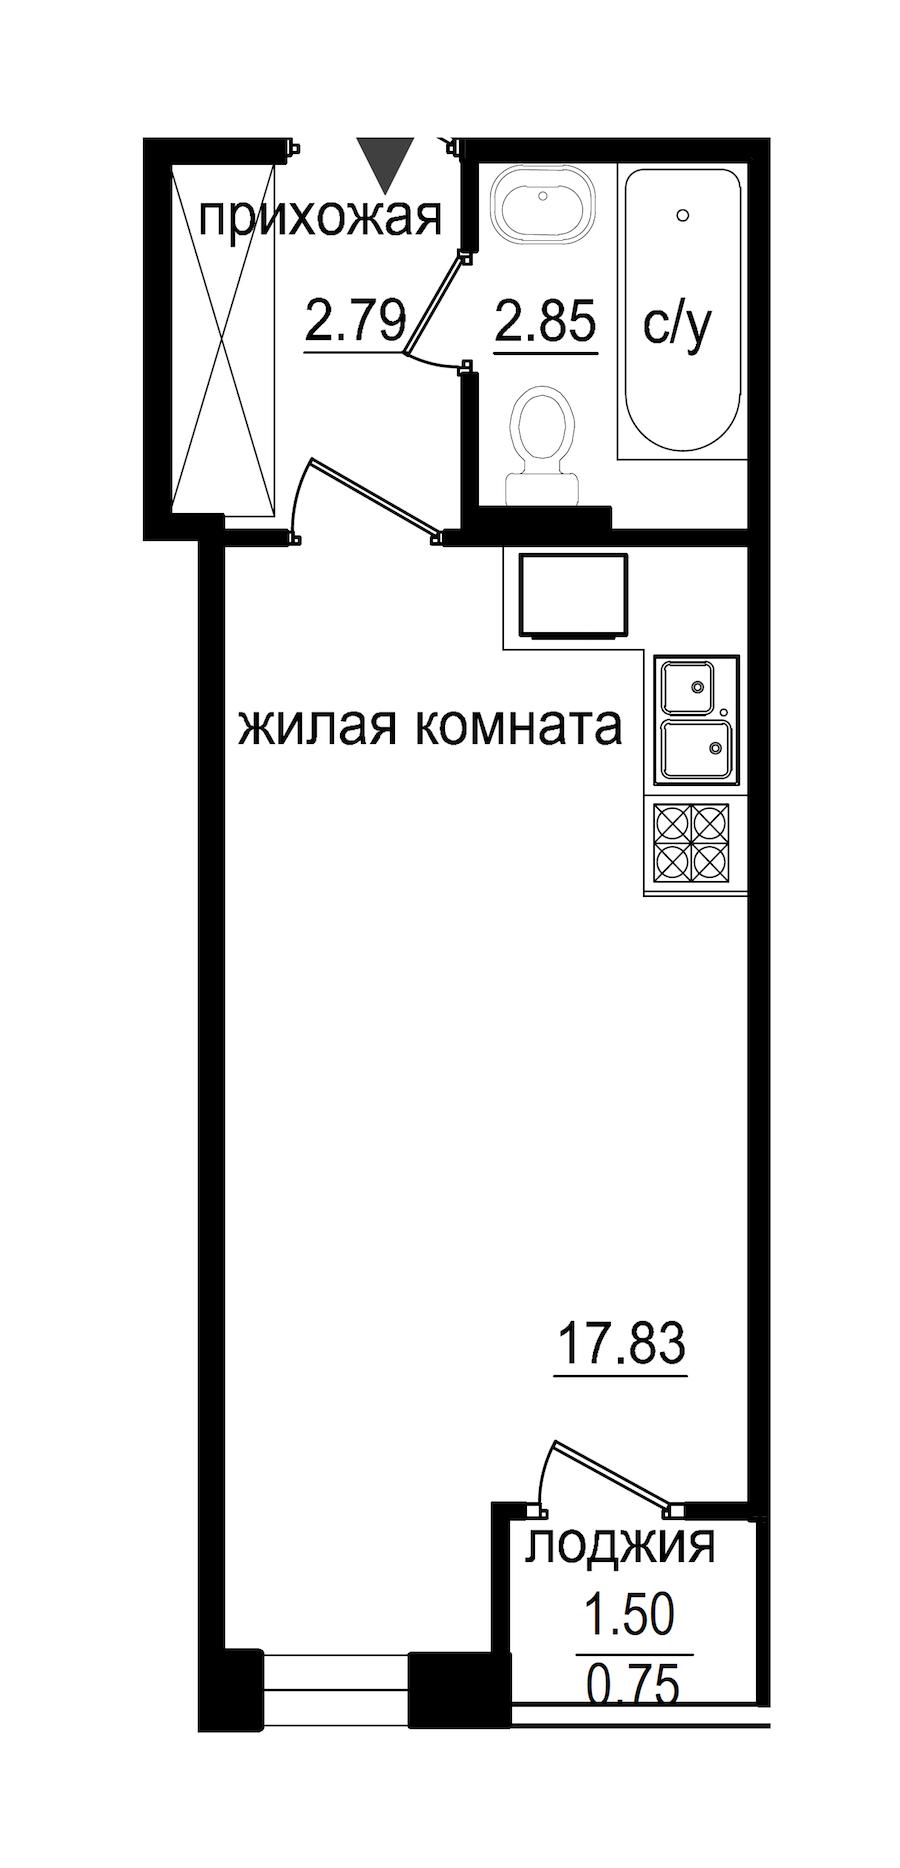 Студия 24 м<sup>2</sup> на 1 этаже